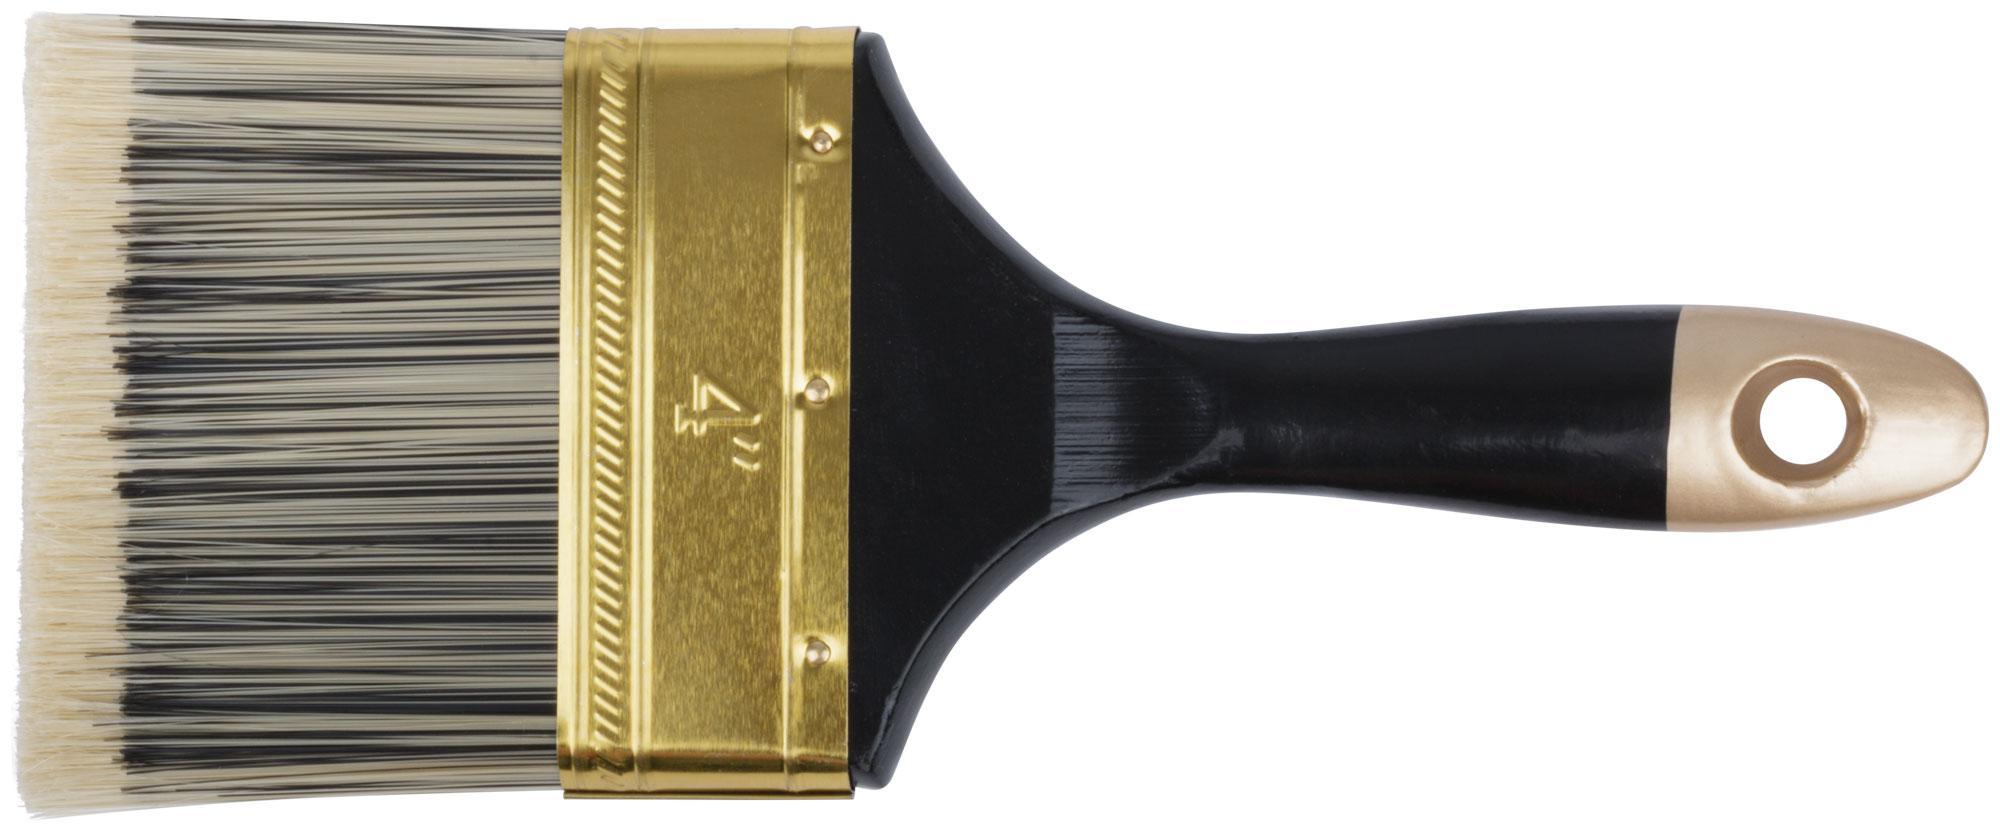 Кисть флейцевая Fit 01188  - Купить